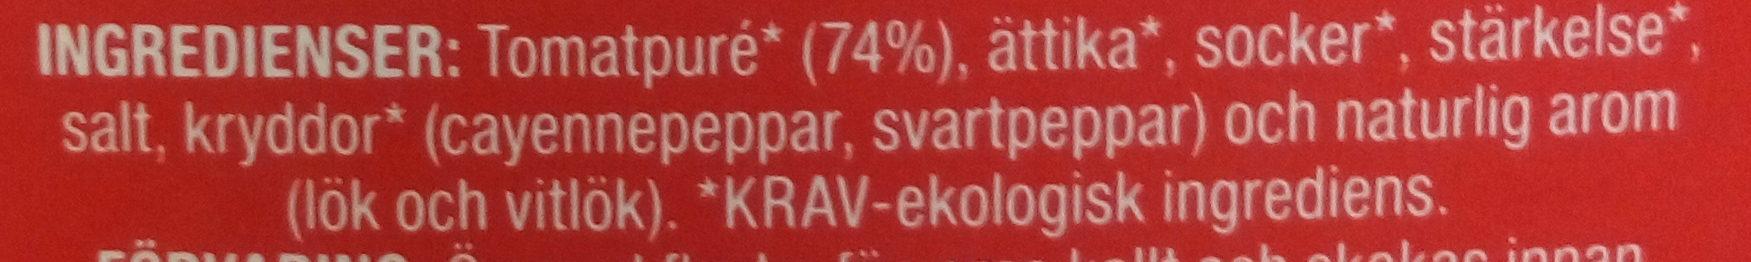 Tomatketchup - Ingredients - sv